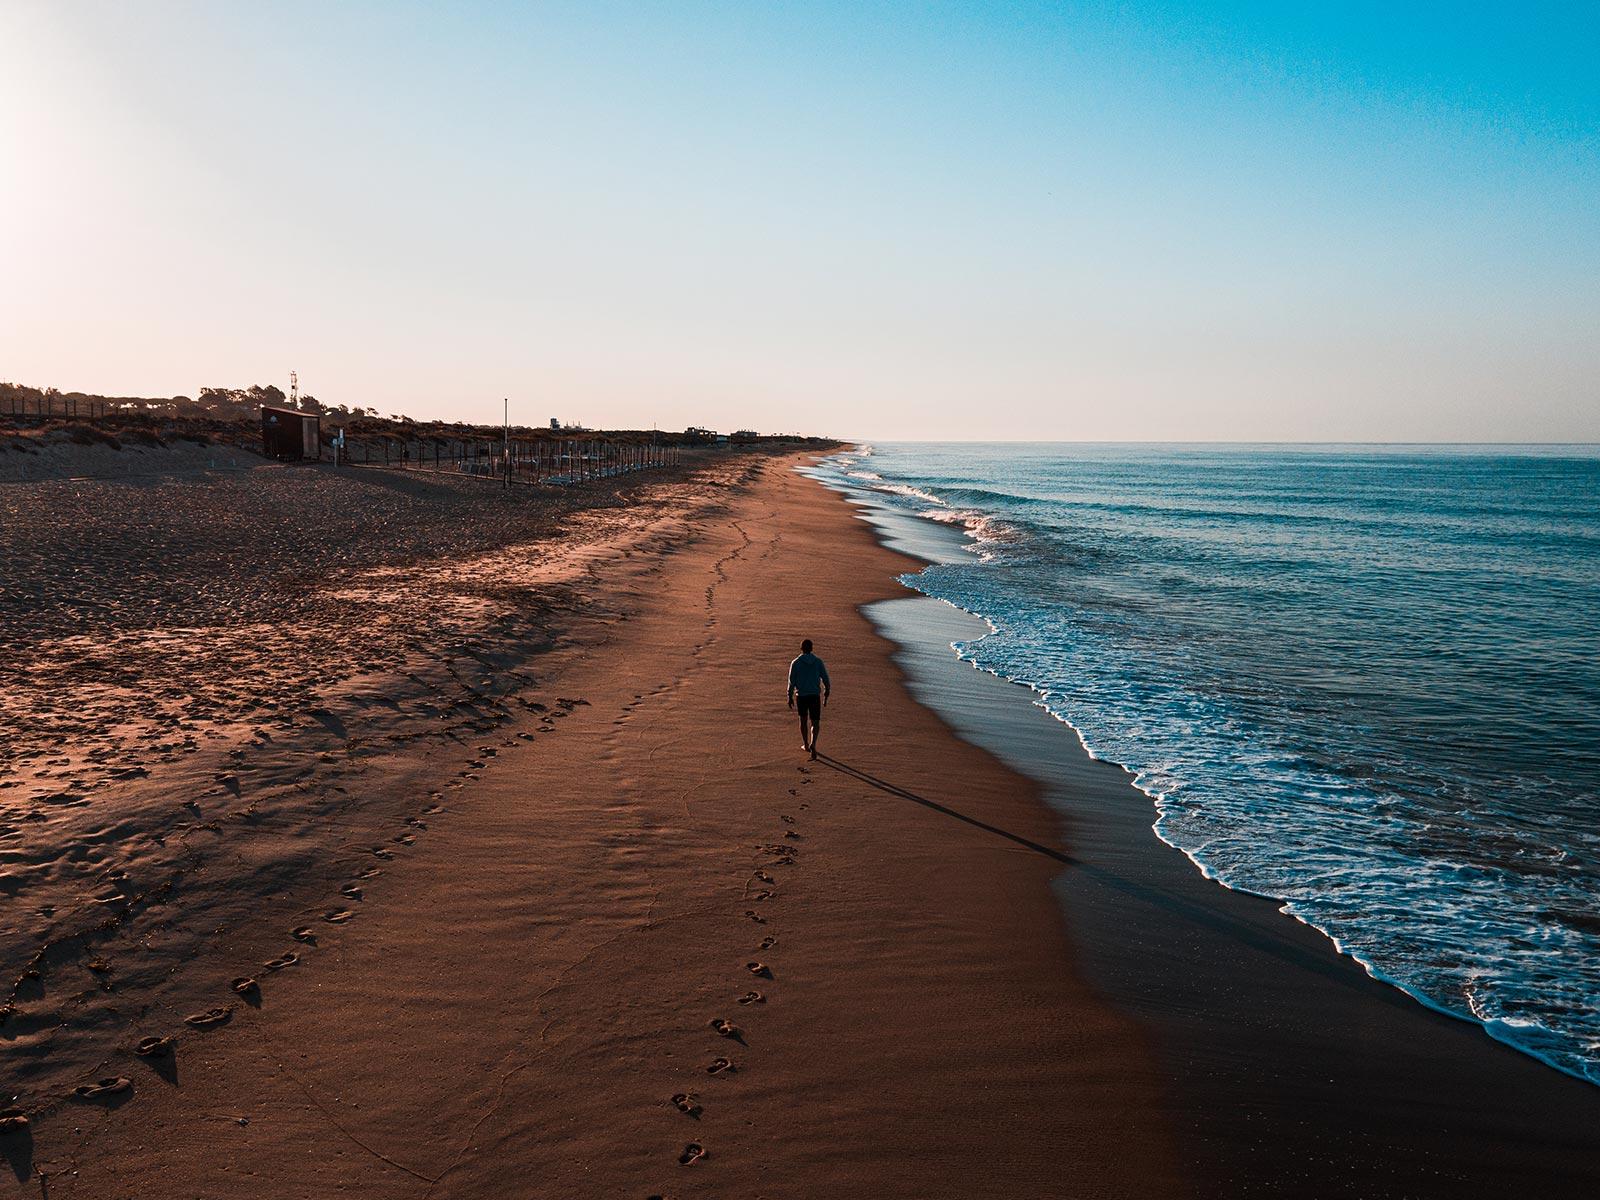 DAVID SIMPSON WALKING DOWN A QUIET BEACH IN PORTUGAL ALONE AT SUNRISE